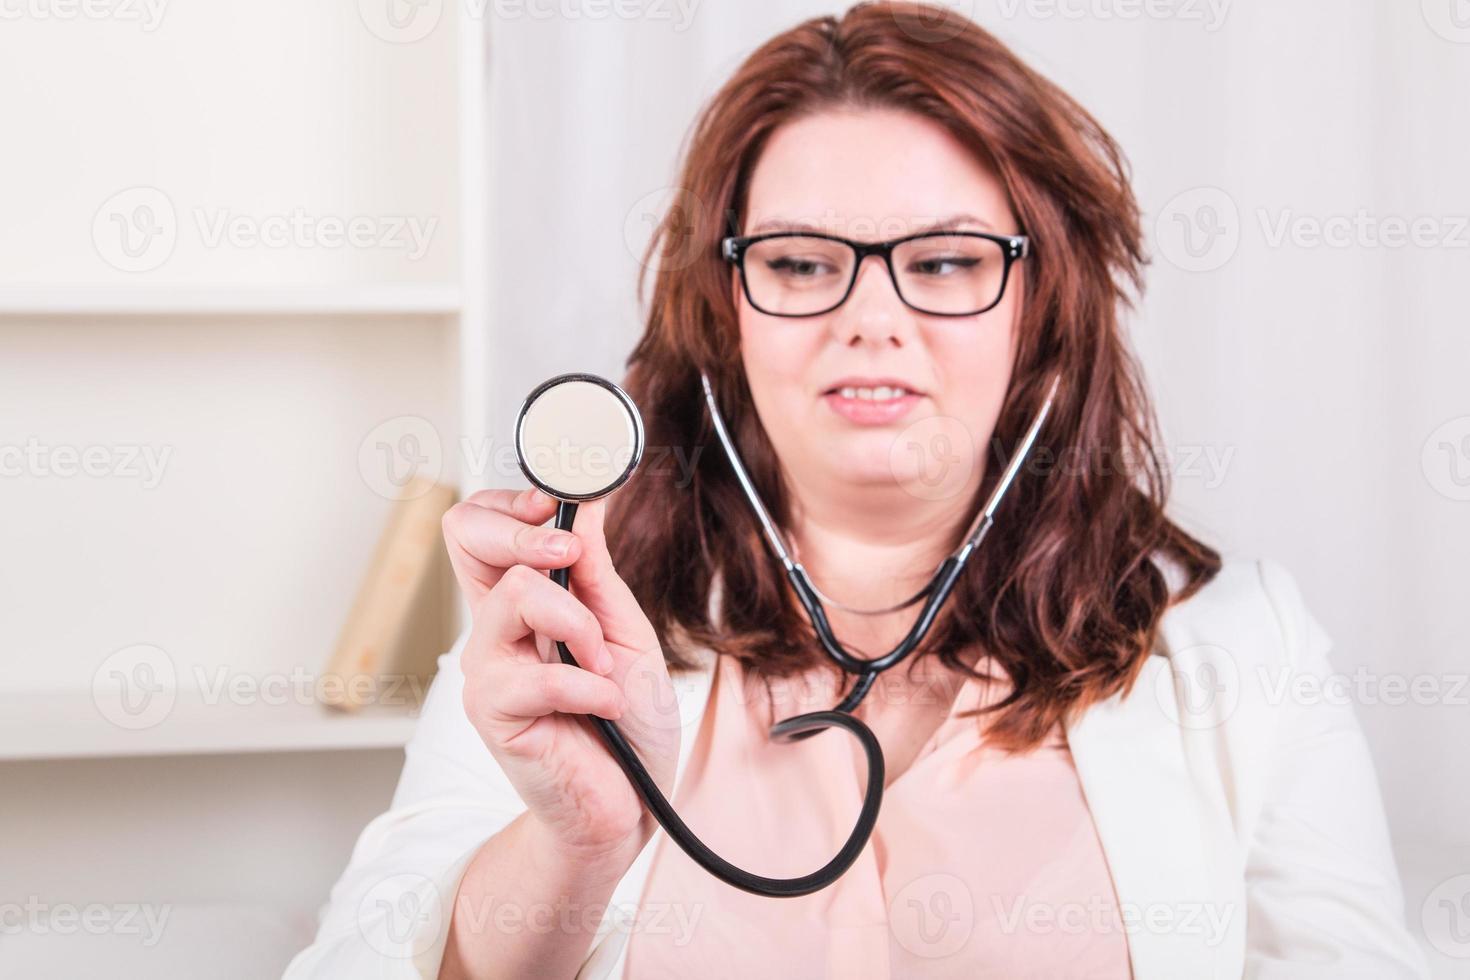 jeune femme médecin avec un stéthoscope examiner photo